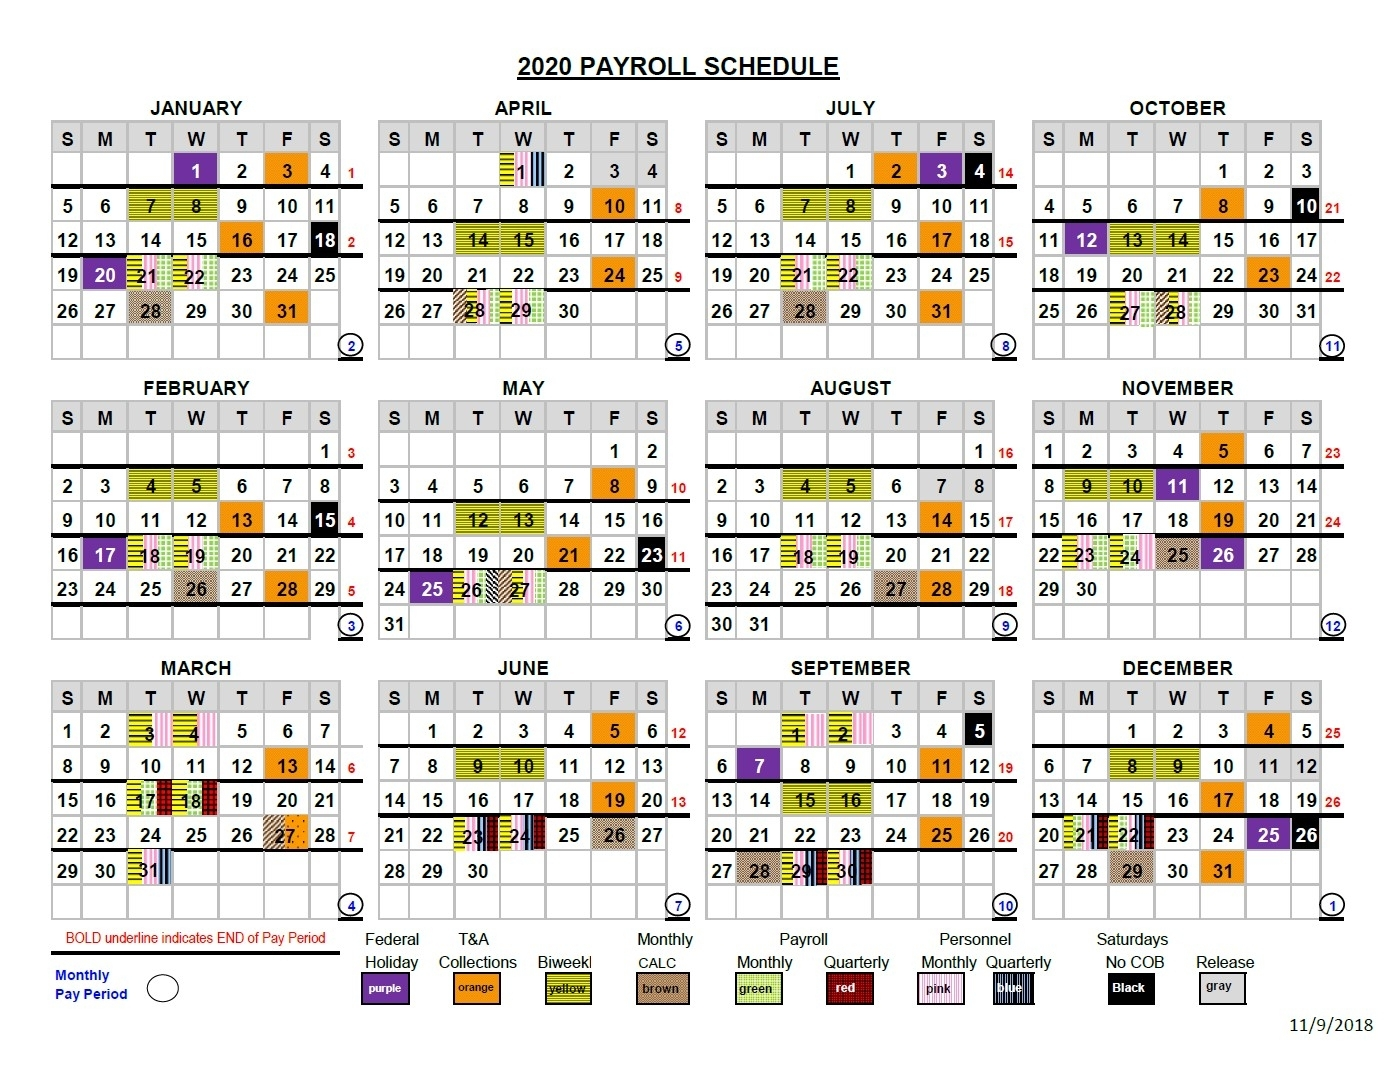 2021 Pay Periods Calendar regarding Federal Pay Periods 2020 Schedule